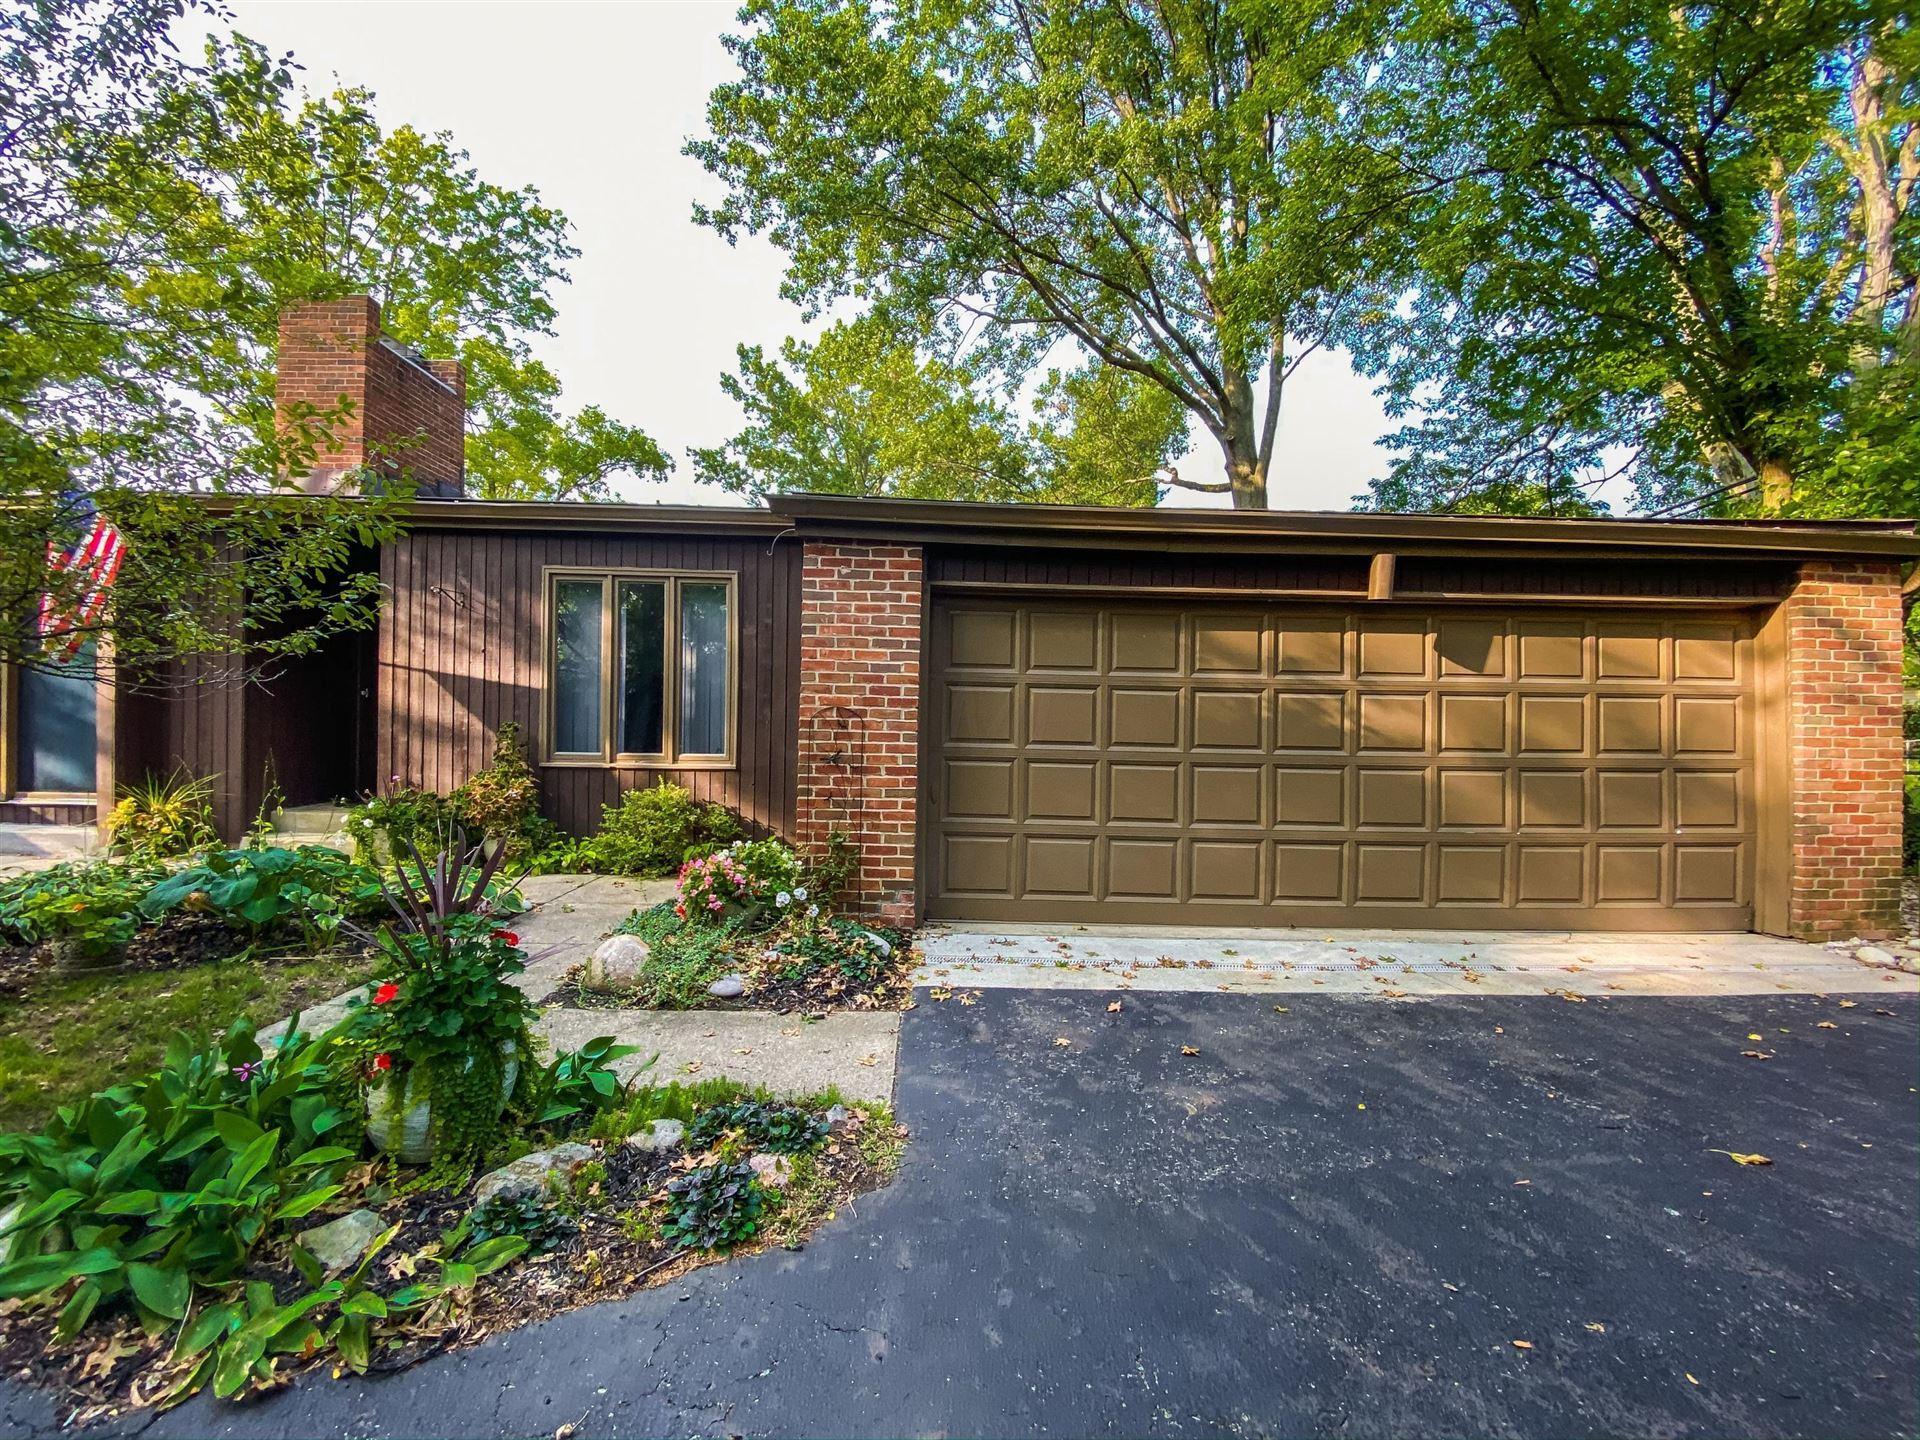 162 Glen Circle, Worthington, OH 43085 - MLS#: 220032171